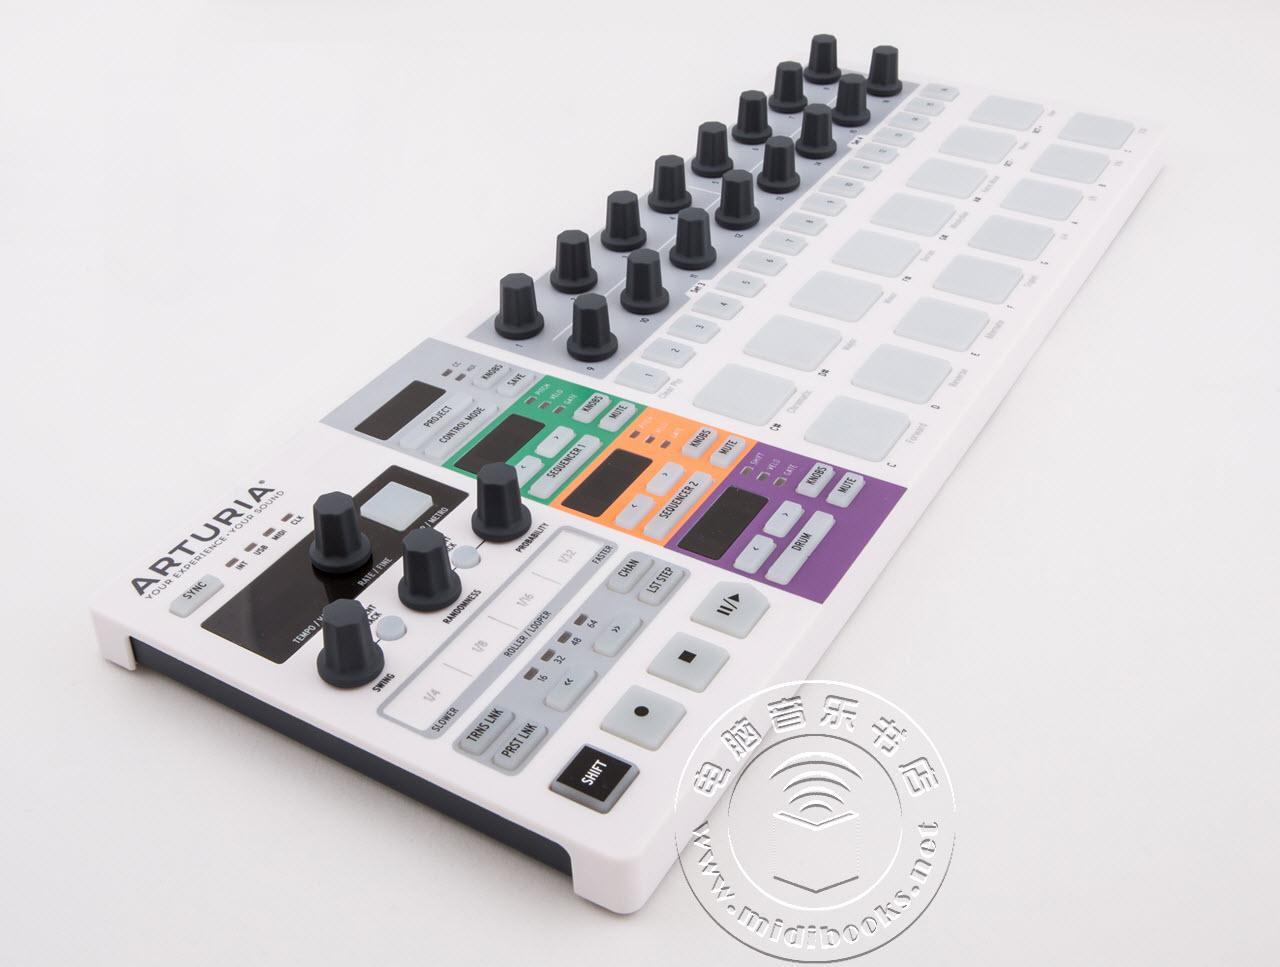 Arturia发布BeatStep Pro MIDI/音序控制器